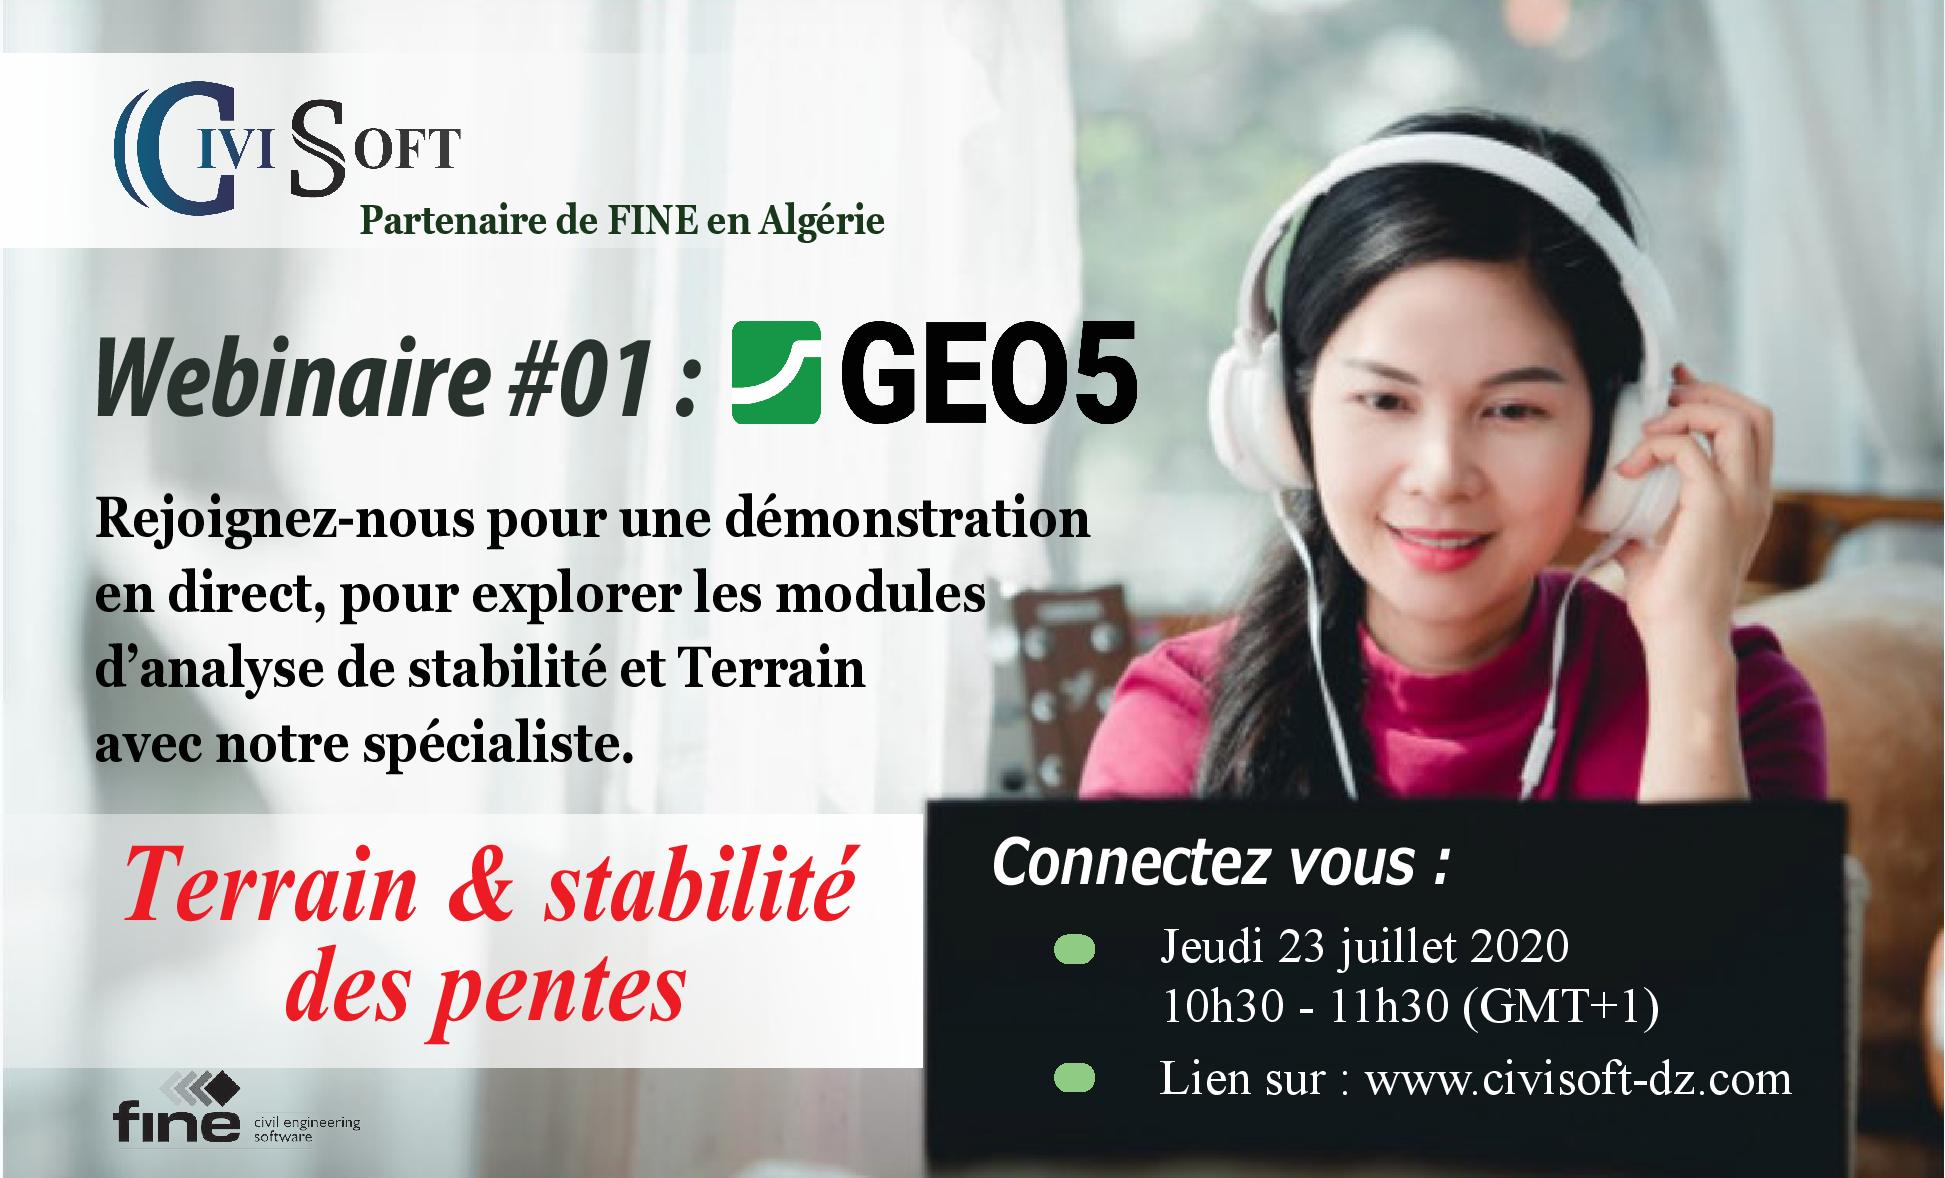 geo5_civisoft_webinar_2020_fr.jpg